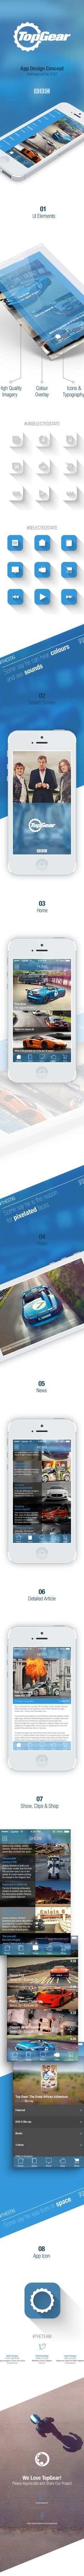 TopGear iOS 7 Redesign Concept by Omni Studio, via Behance